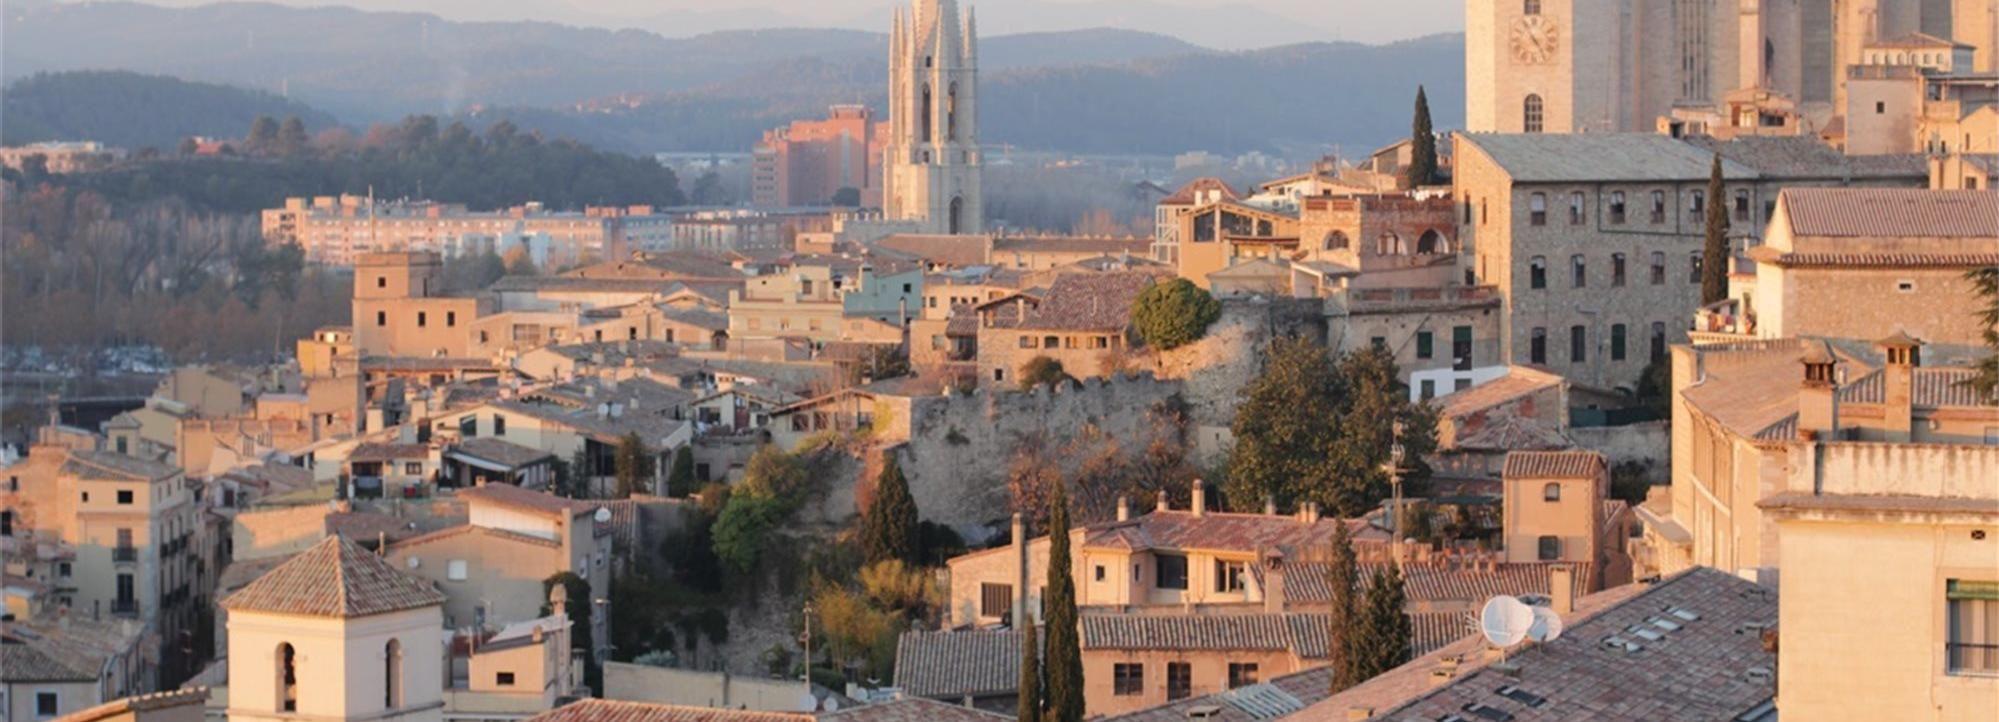 Girona: Private History Tour